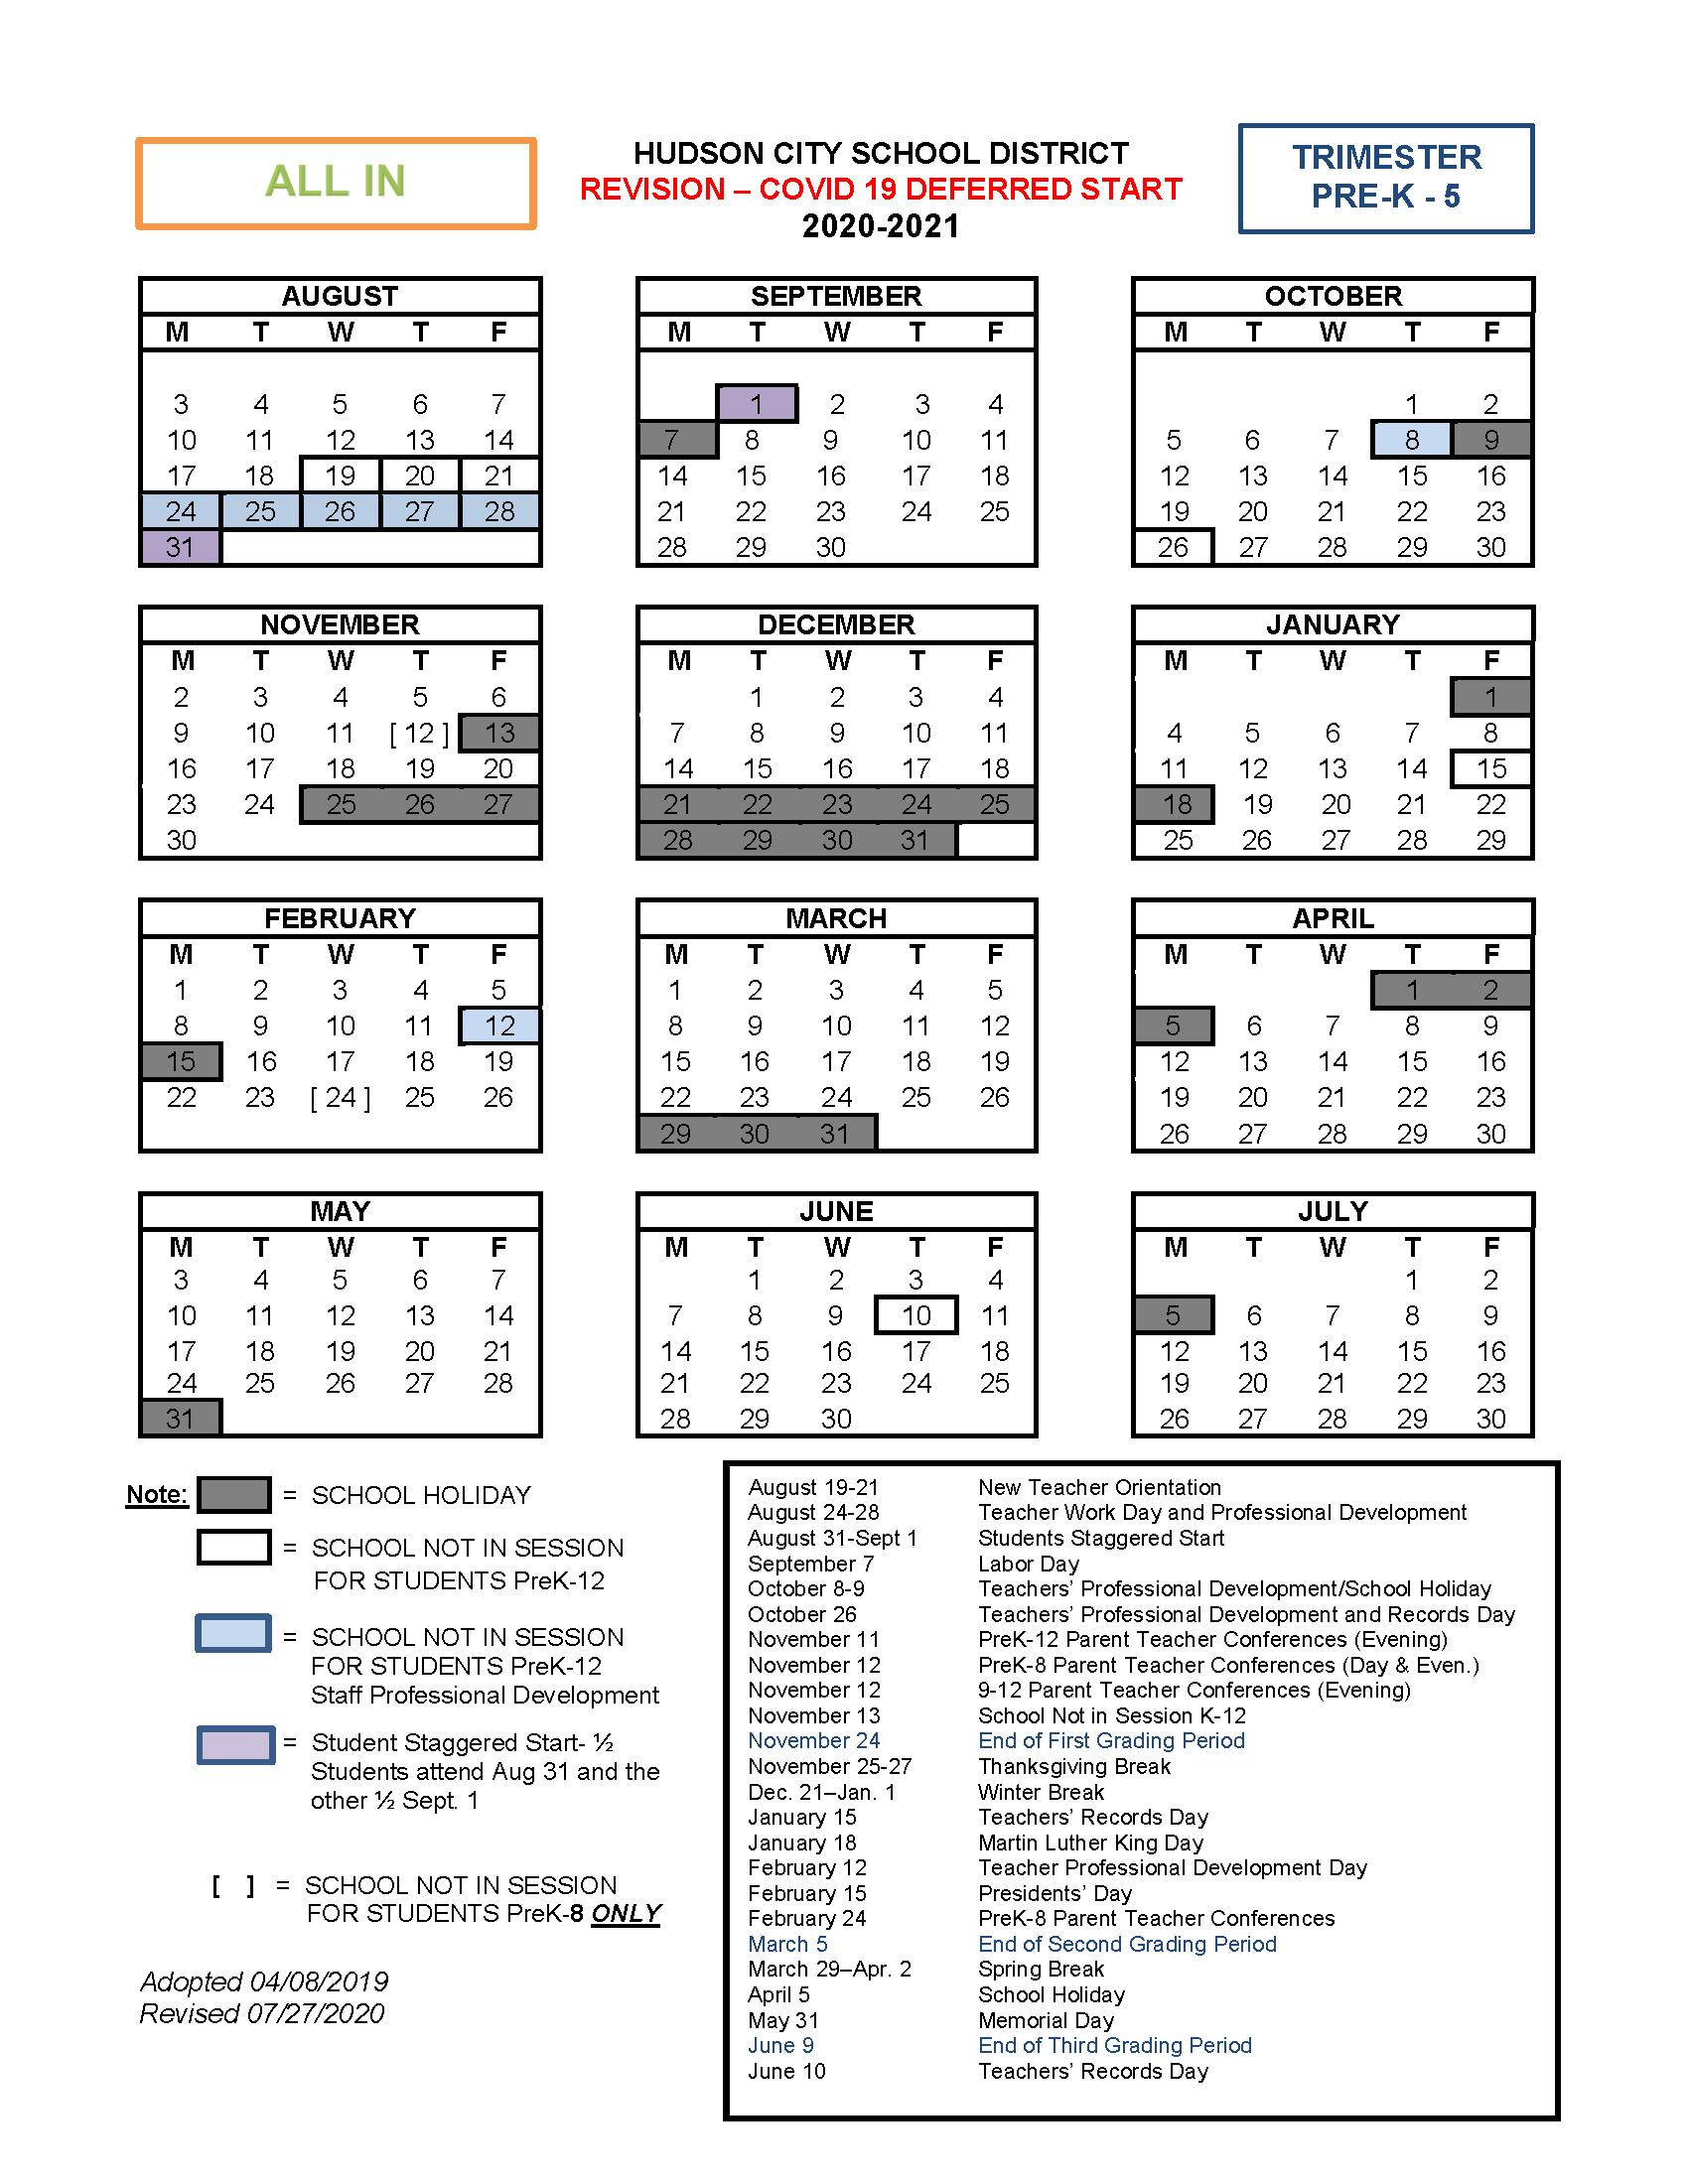 Columbus City Schools Calendar 2022 2023.About Hcsd School Year Calendars